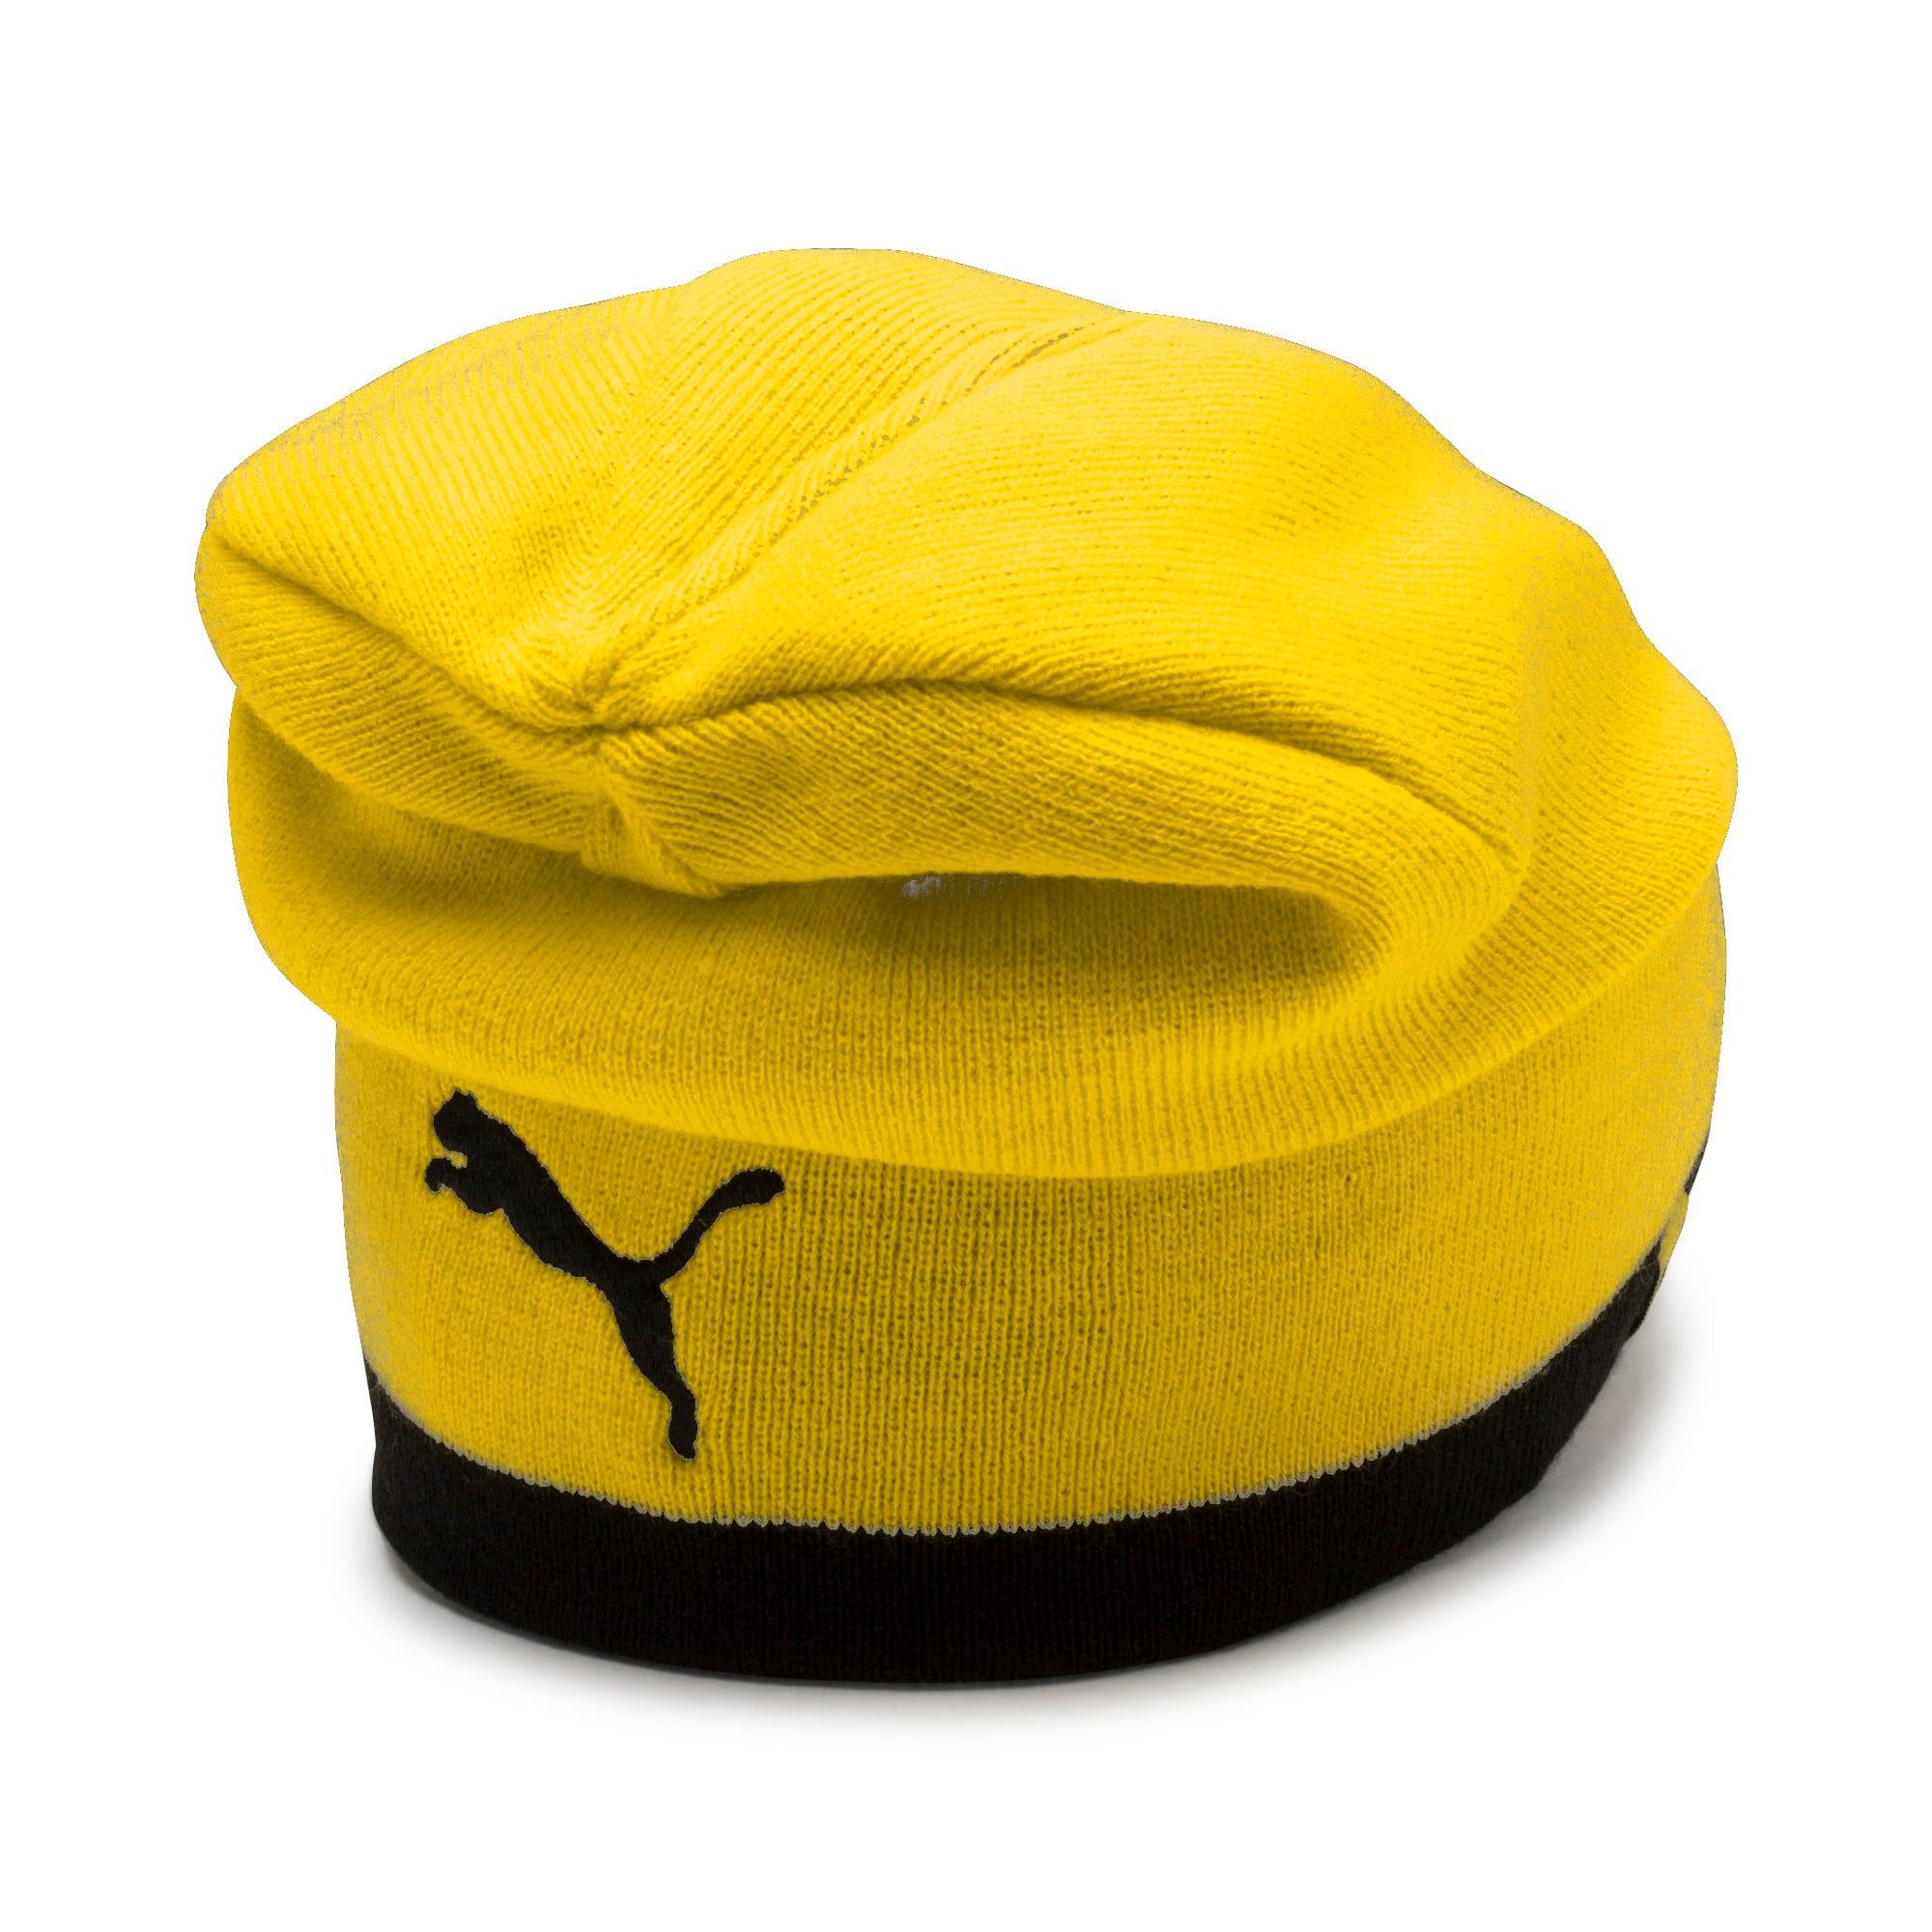 Thumbnail 2 of BVB Reversible Beanie, Puma Black-Cyber Yellow, medium